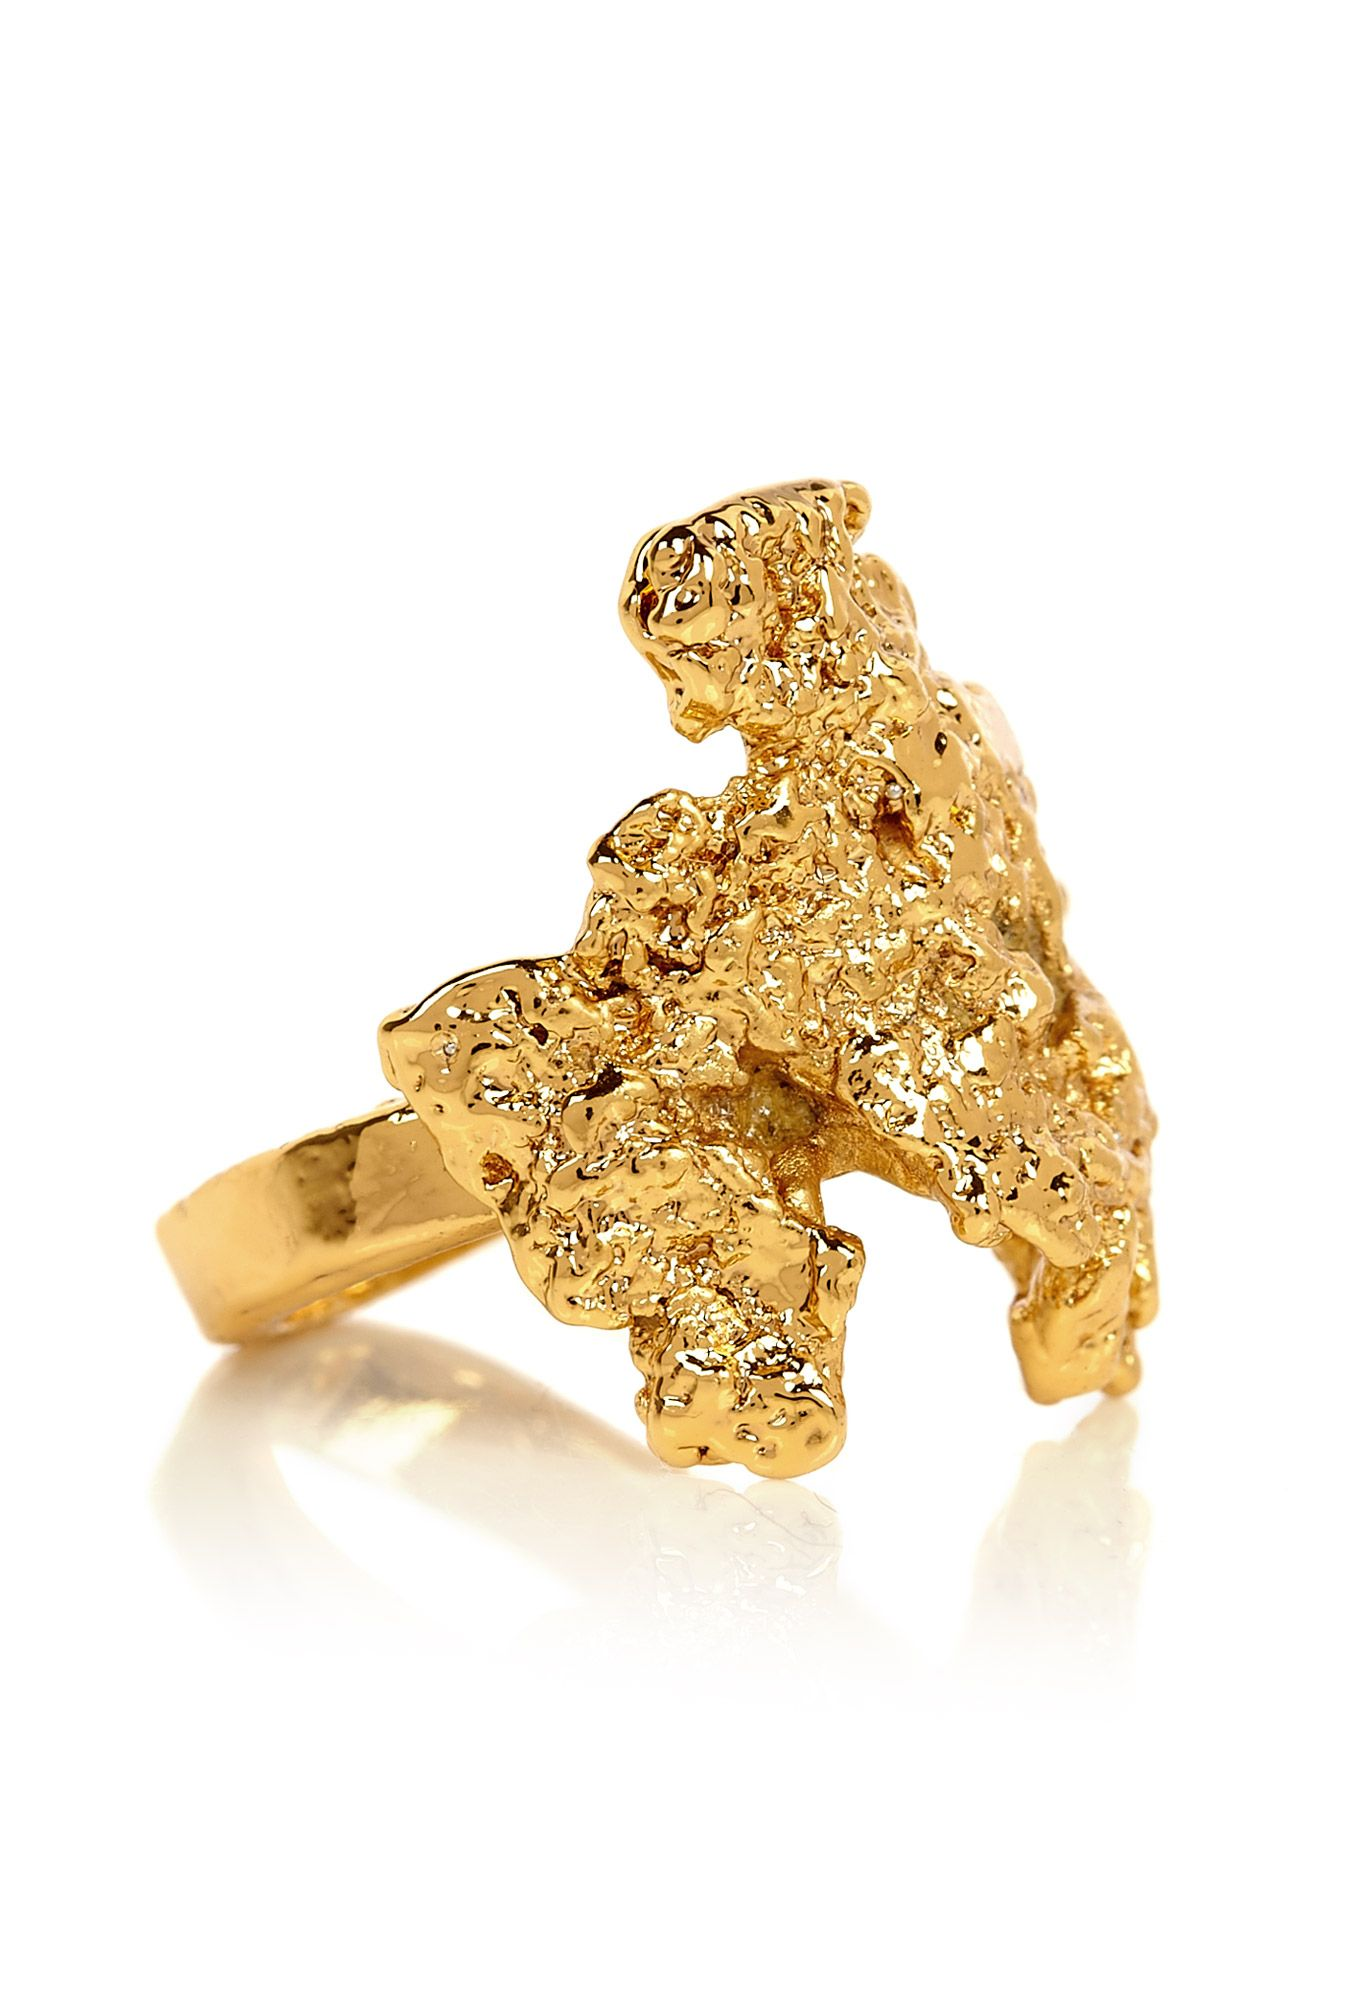 Gold ausonia molten nugget ring by estelle dévé as close as iull get